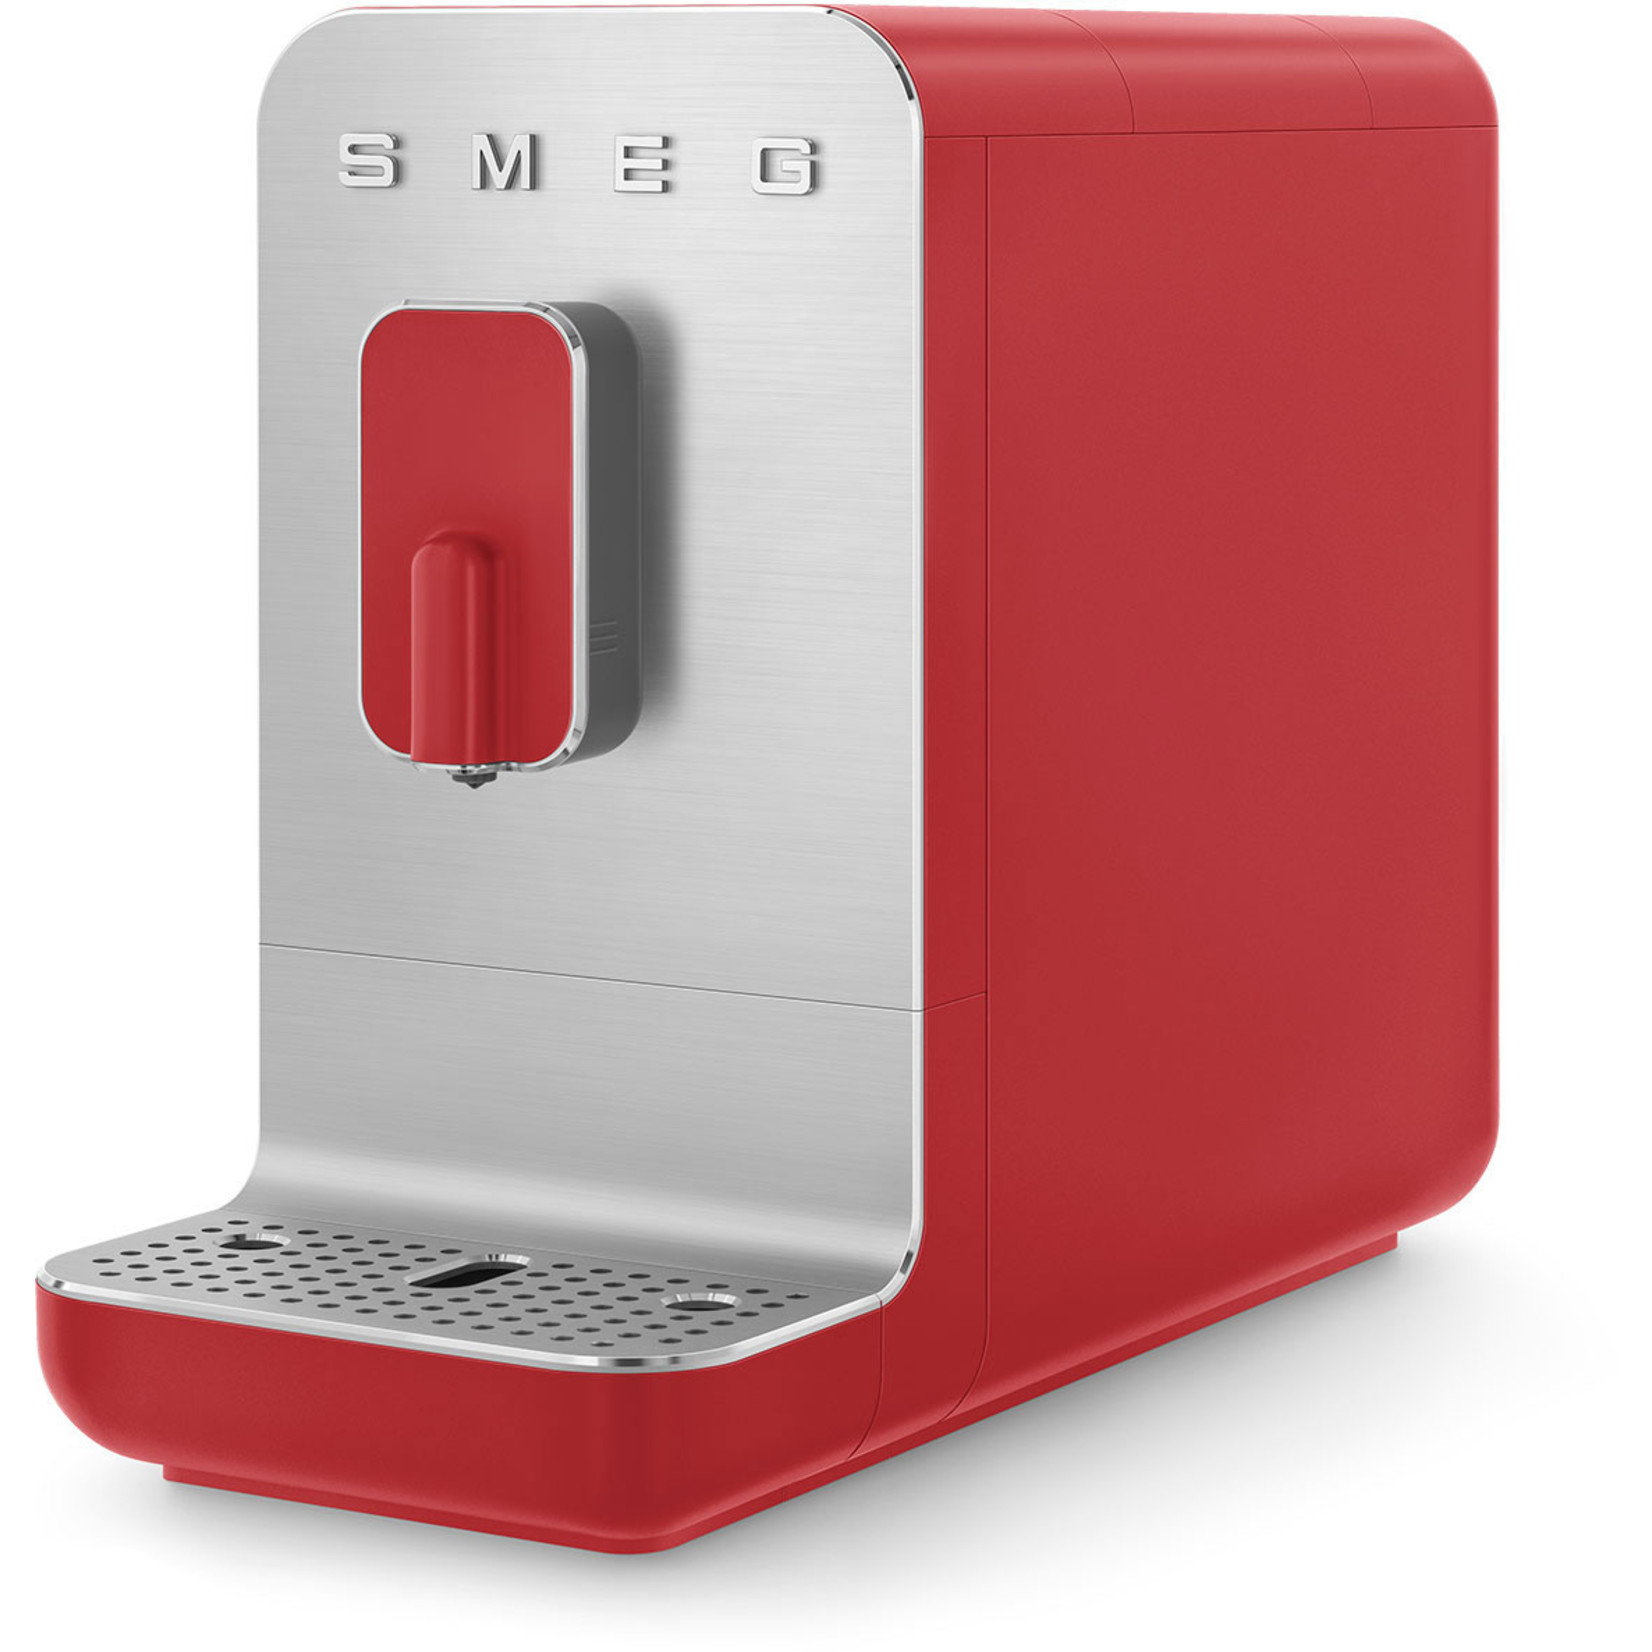 Smeg Smeg espressomachine basic, mat rood